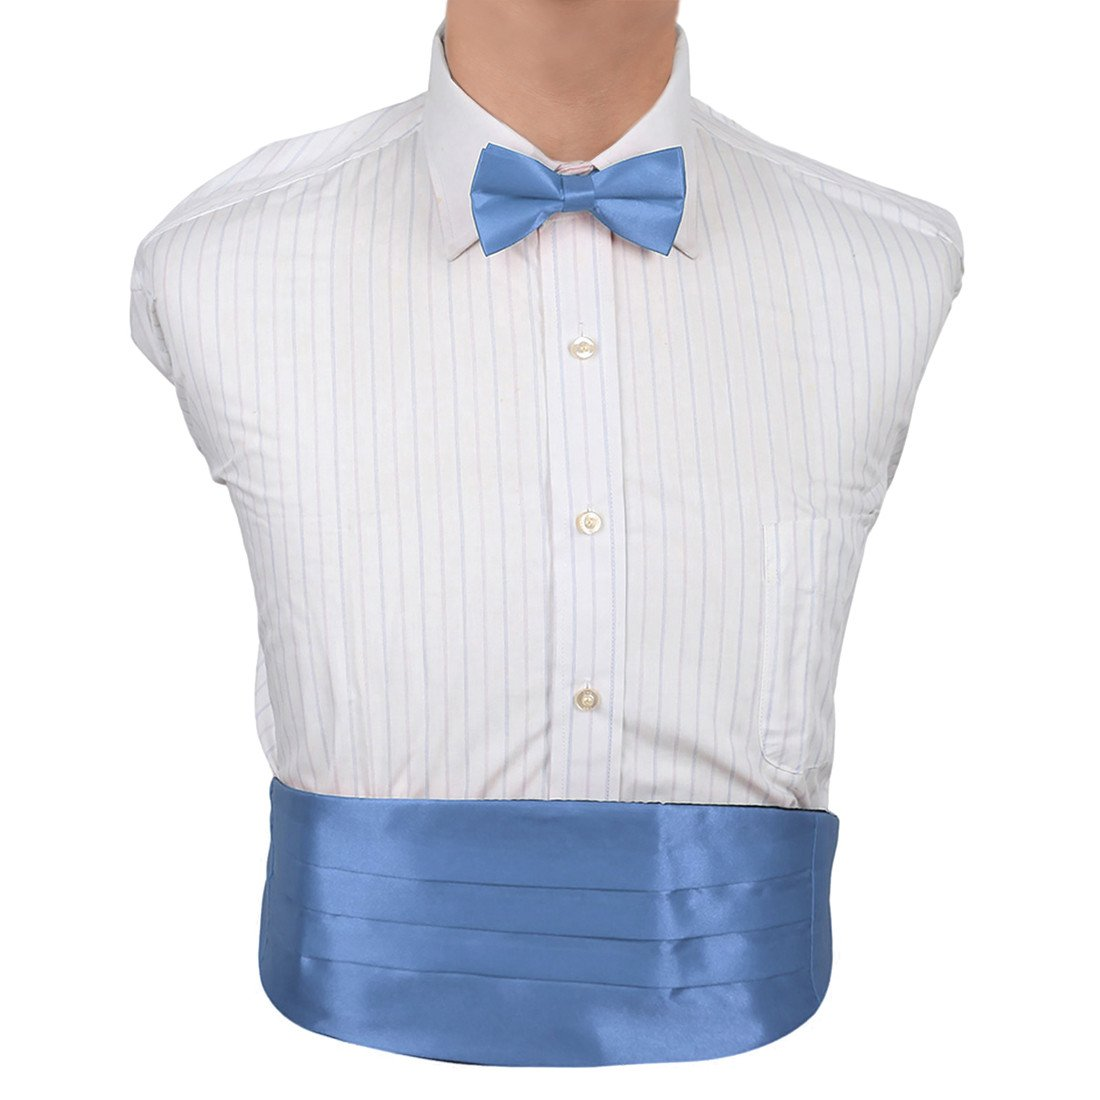 DIC1E01Q Dark Forest Green Plain Microfiber Cummerbund Tie Set For Lawyers Cummerbund Matching Bow Tie By Dan Smith